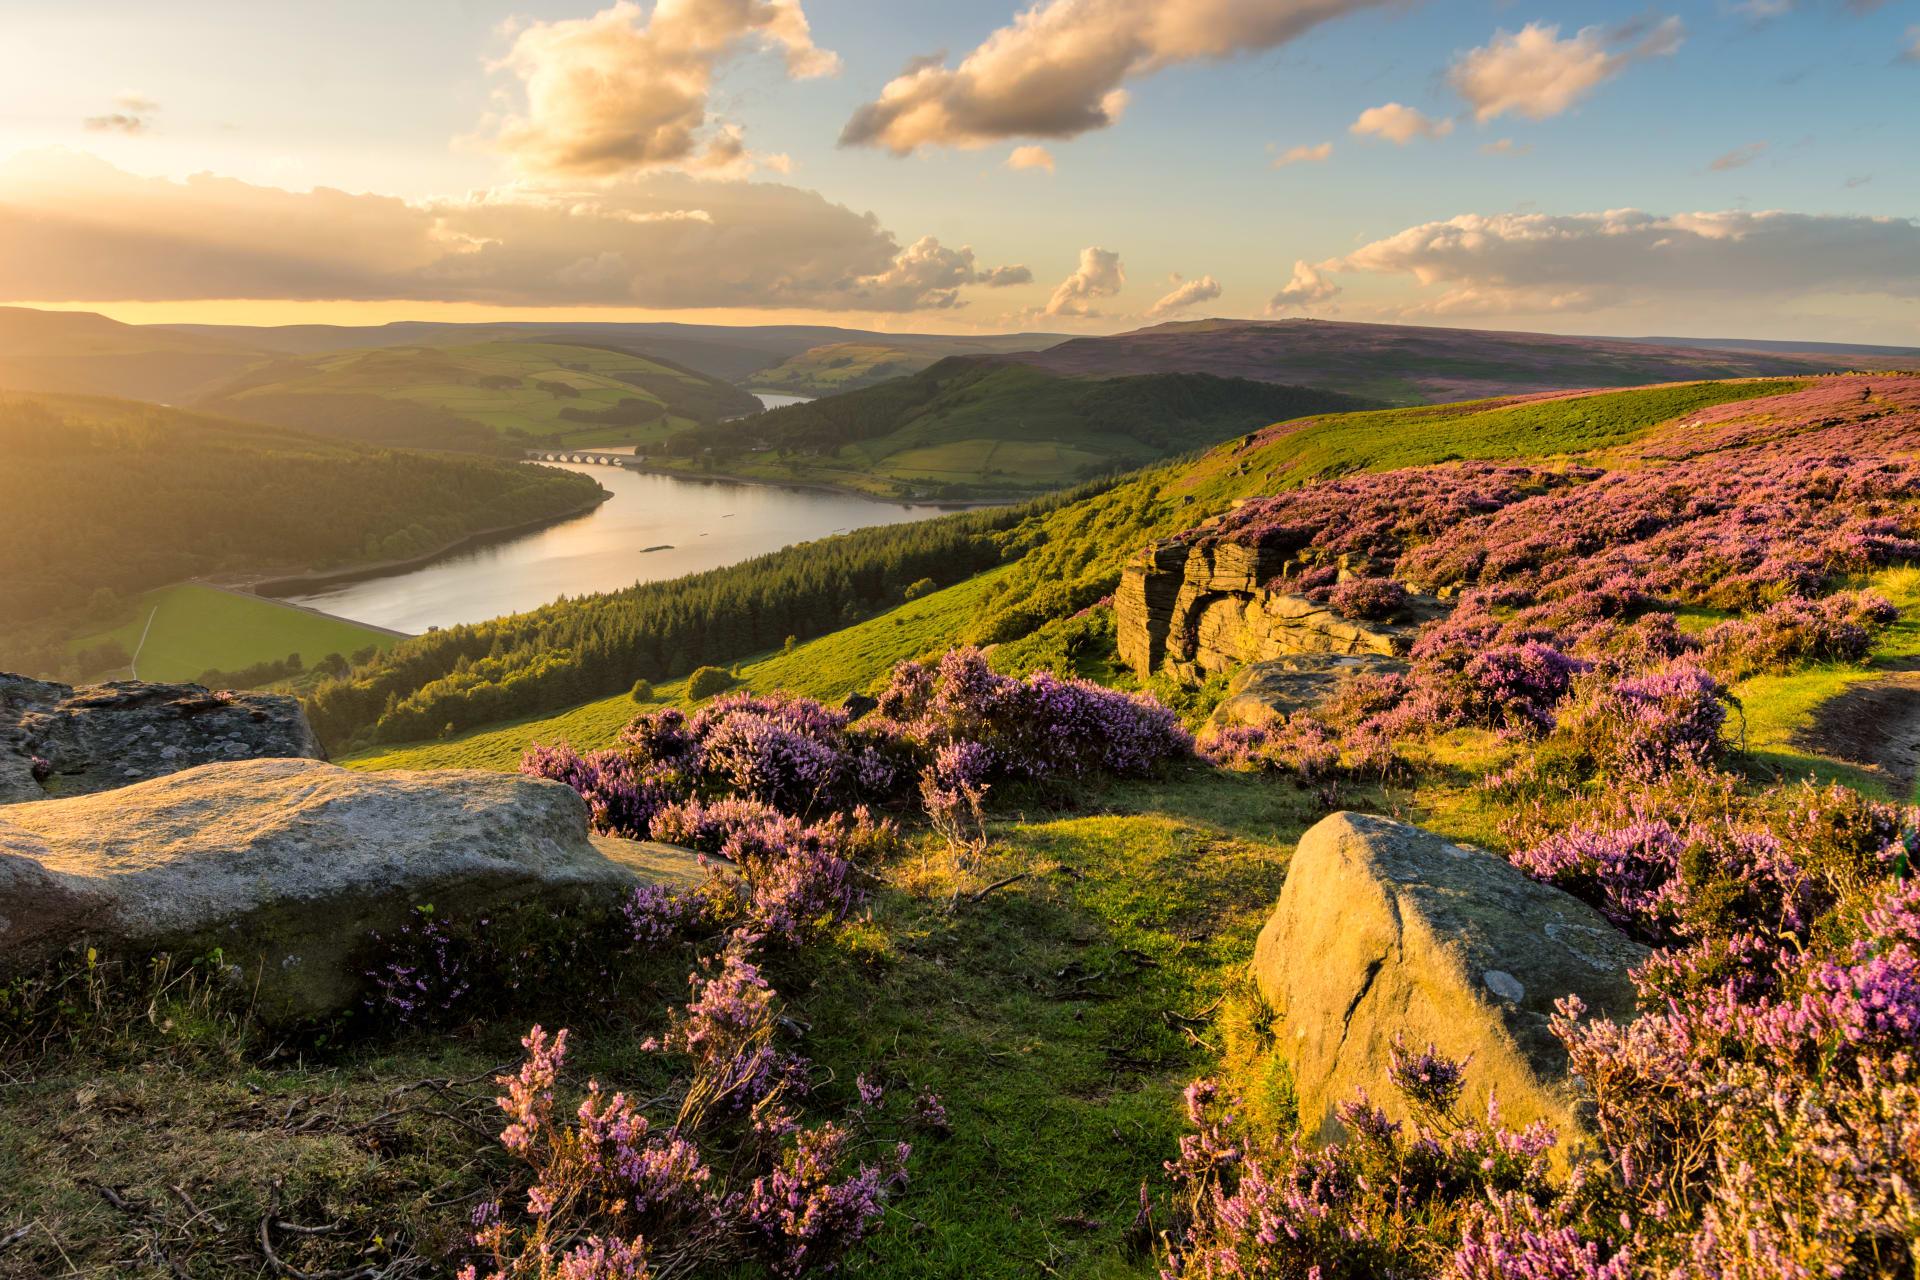 Peak District cover image